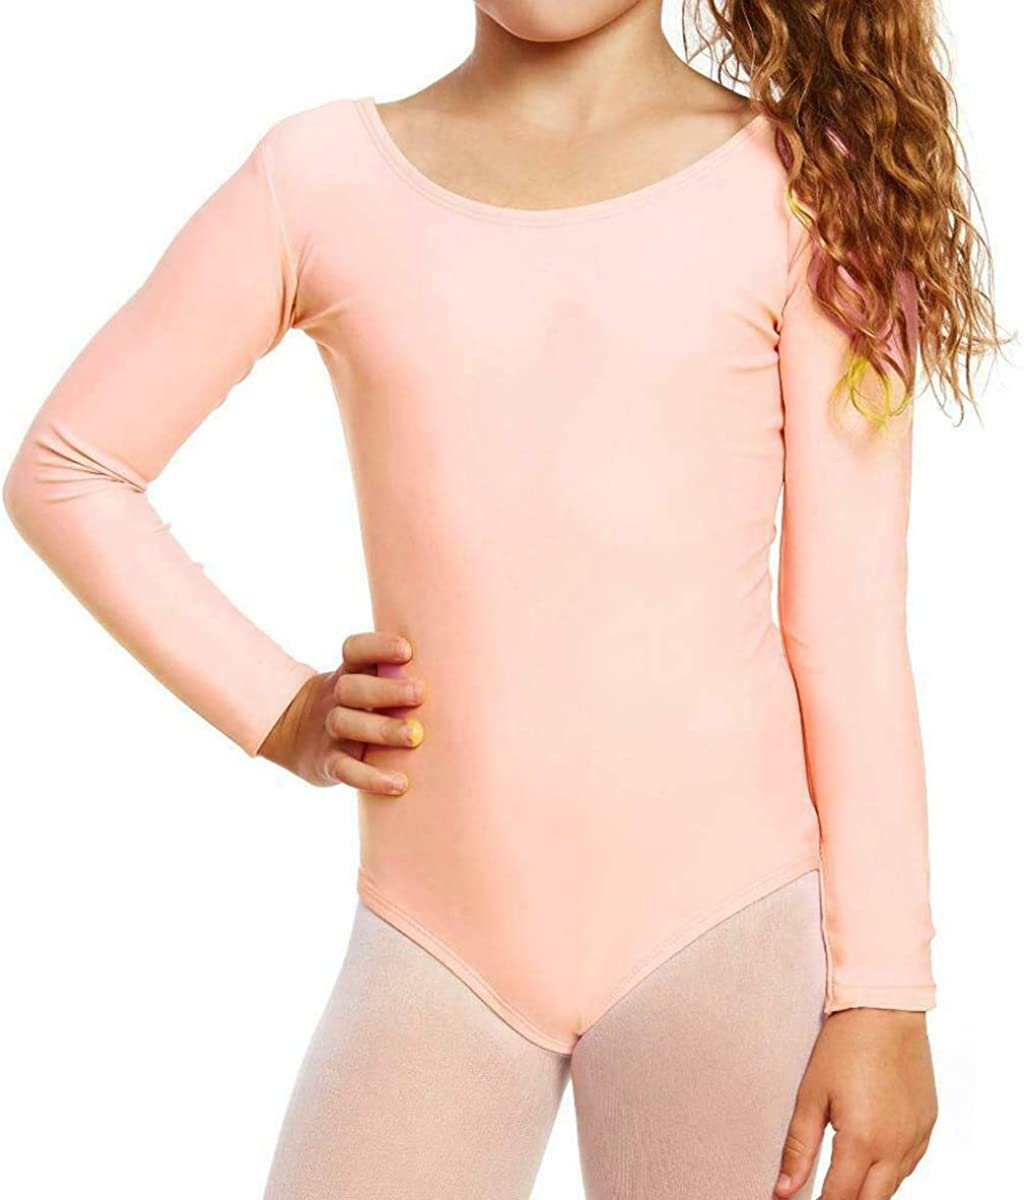 Loxdonz Girls Leotard Basic Long Sleeve Ballet Dance Leotard Kids Stretch Gymnastics Bodysuit Top : Clothing, Shoes & Jewelry